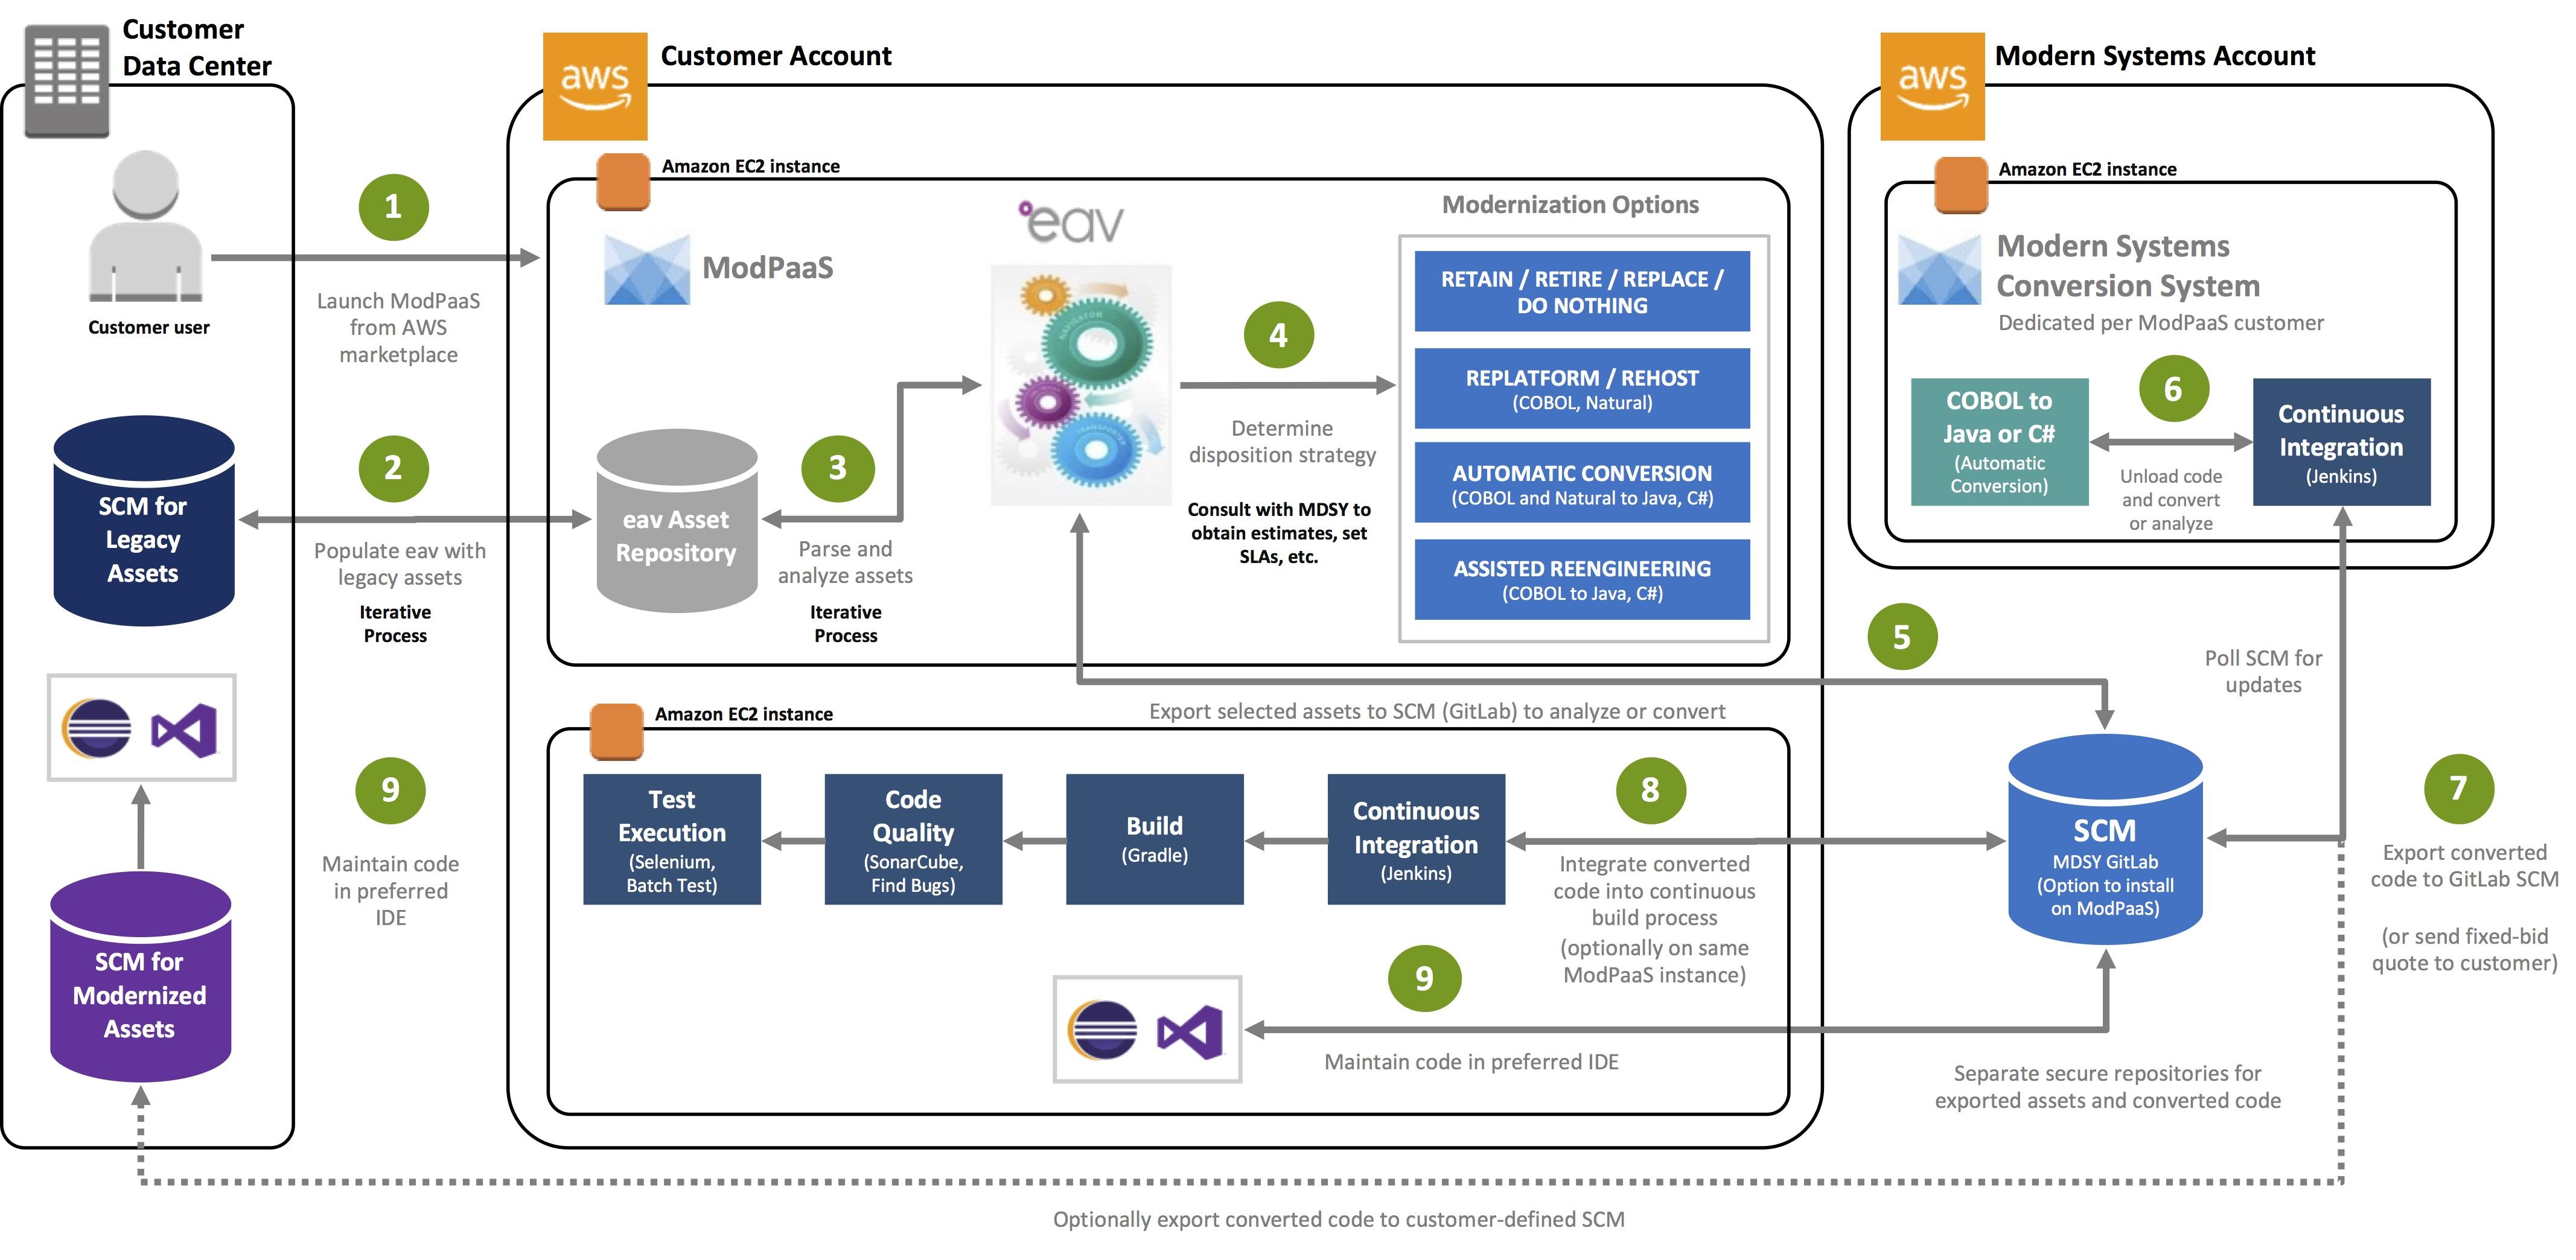 Mainframe Modernization Platform-as-a-Service (ModPaaS) from Modern